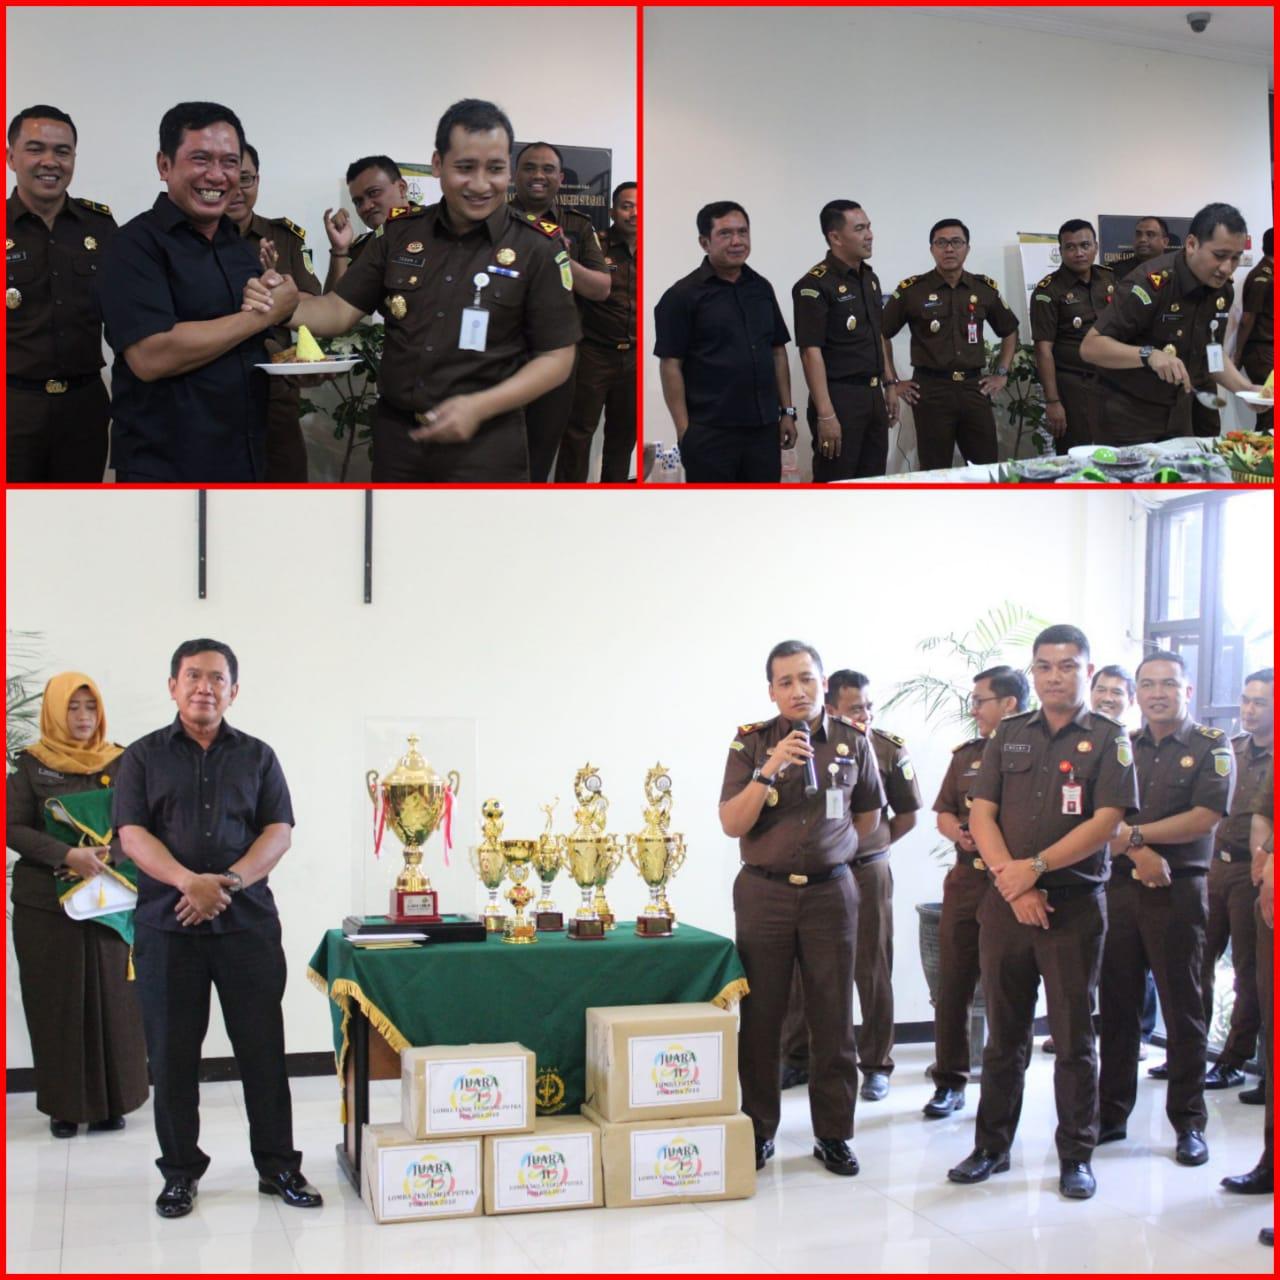 Syukuran Juara Umum Hari Bakti Adhyaksa H.B.A ke-58 24-07-2018